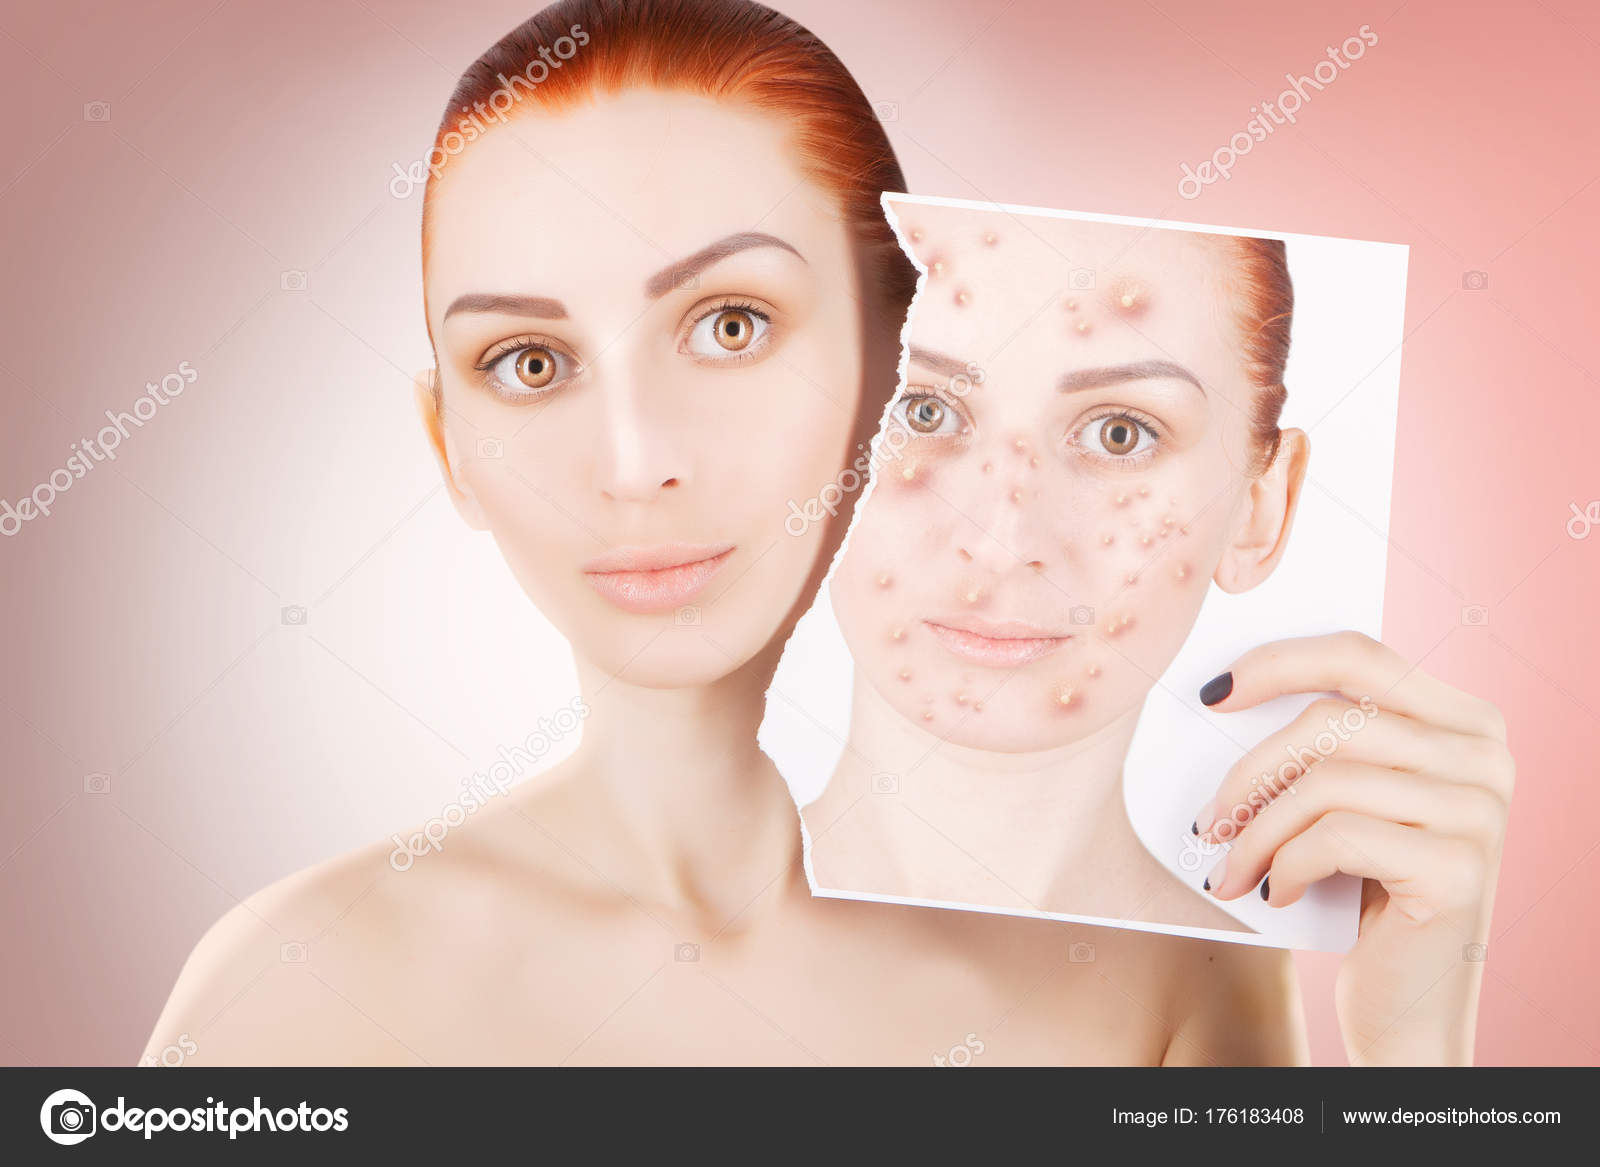 acne problemen